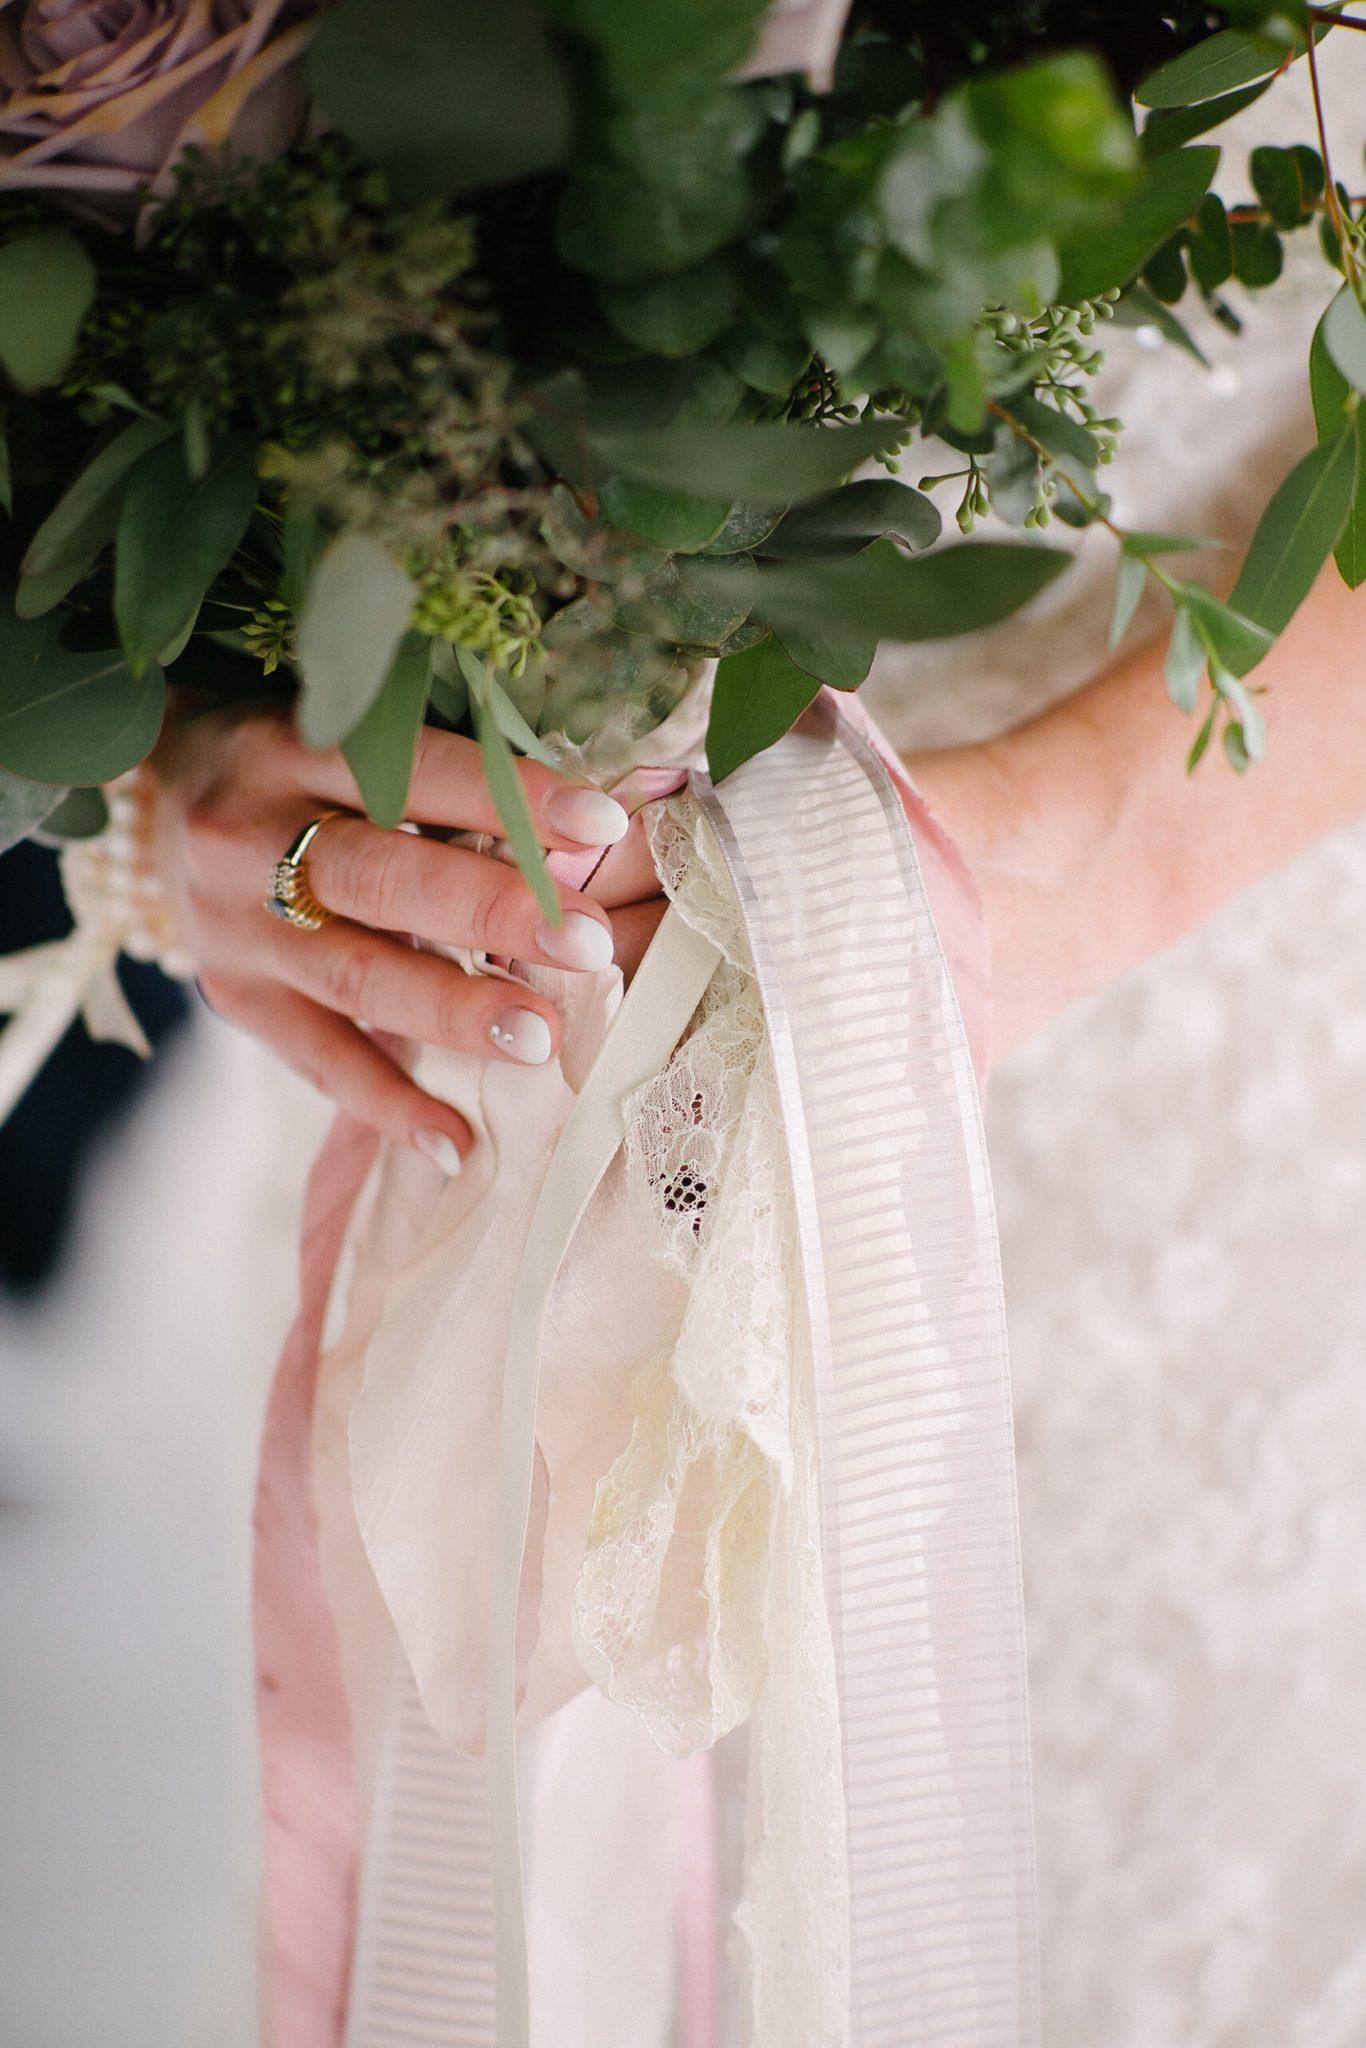 Dayton wedding, wedding florist, dayton florist, Cincinnati florist, wedding flowers, bridal bouquet, sugar valley country club